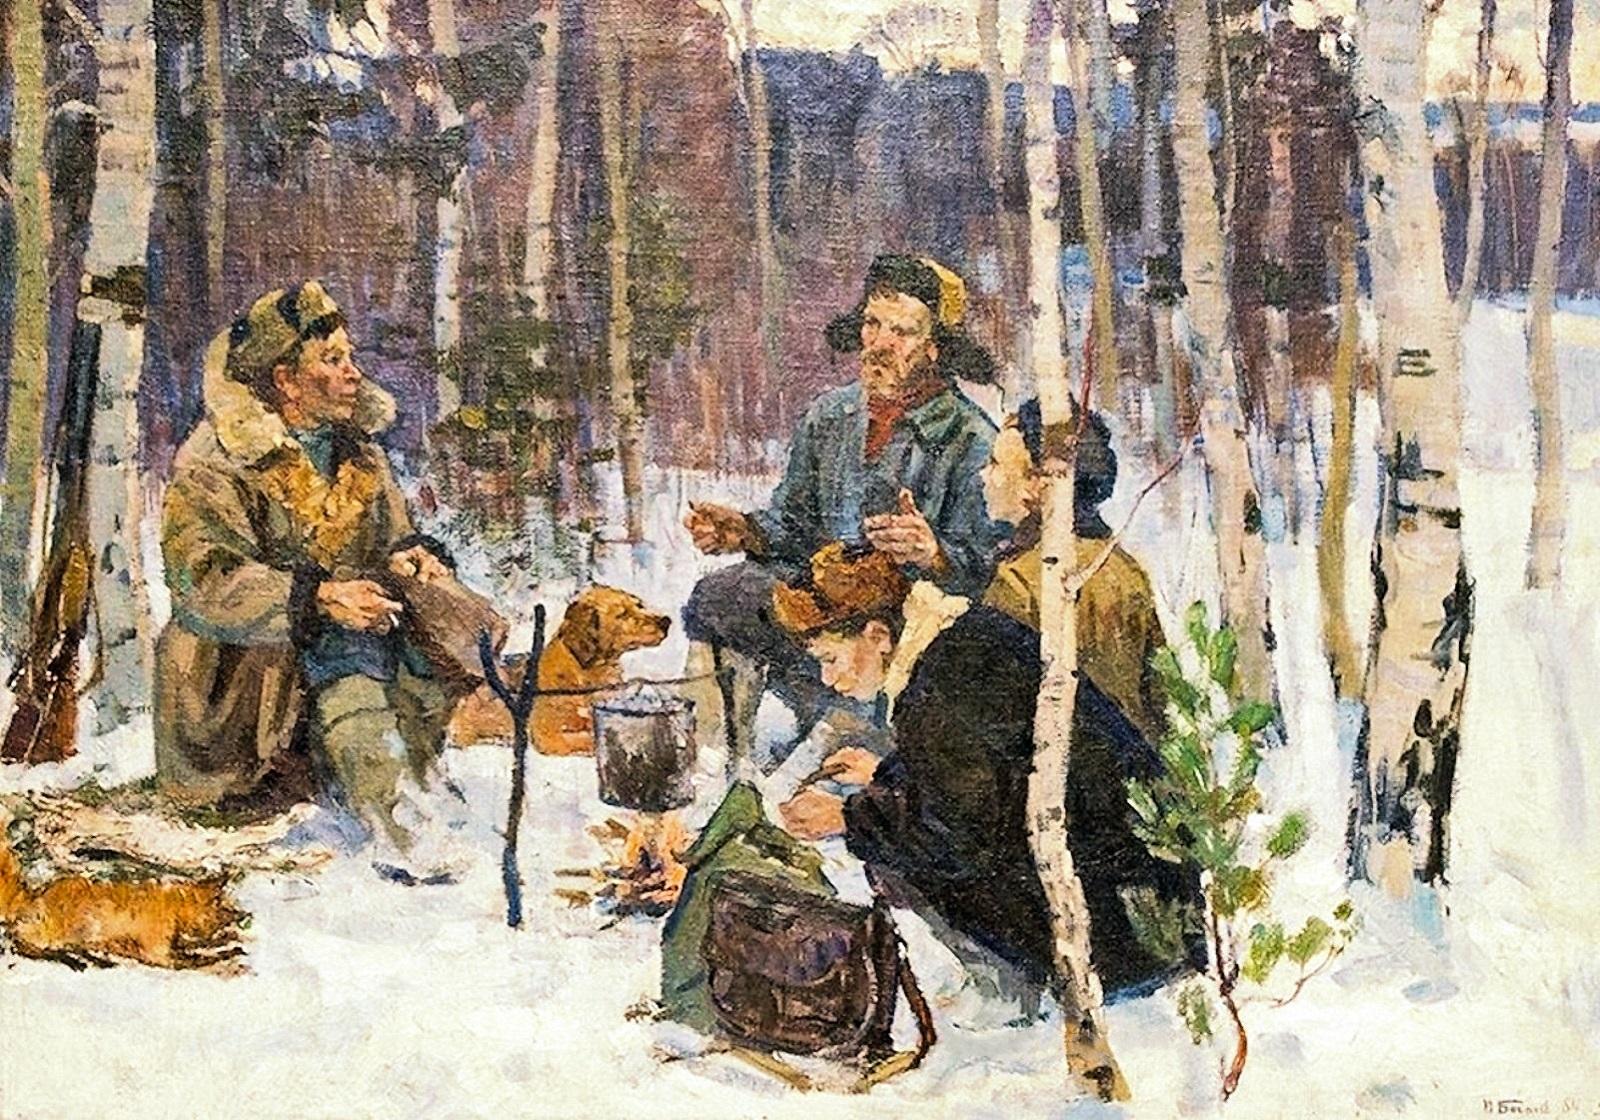 00-pyotr-bogachyov-hunters-taking-a-break-1964